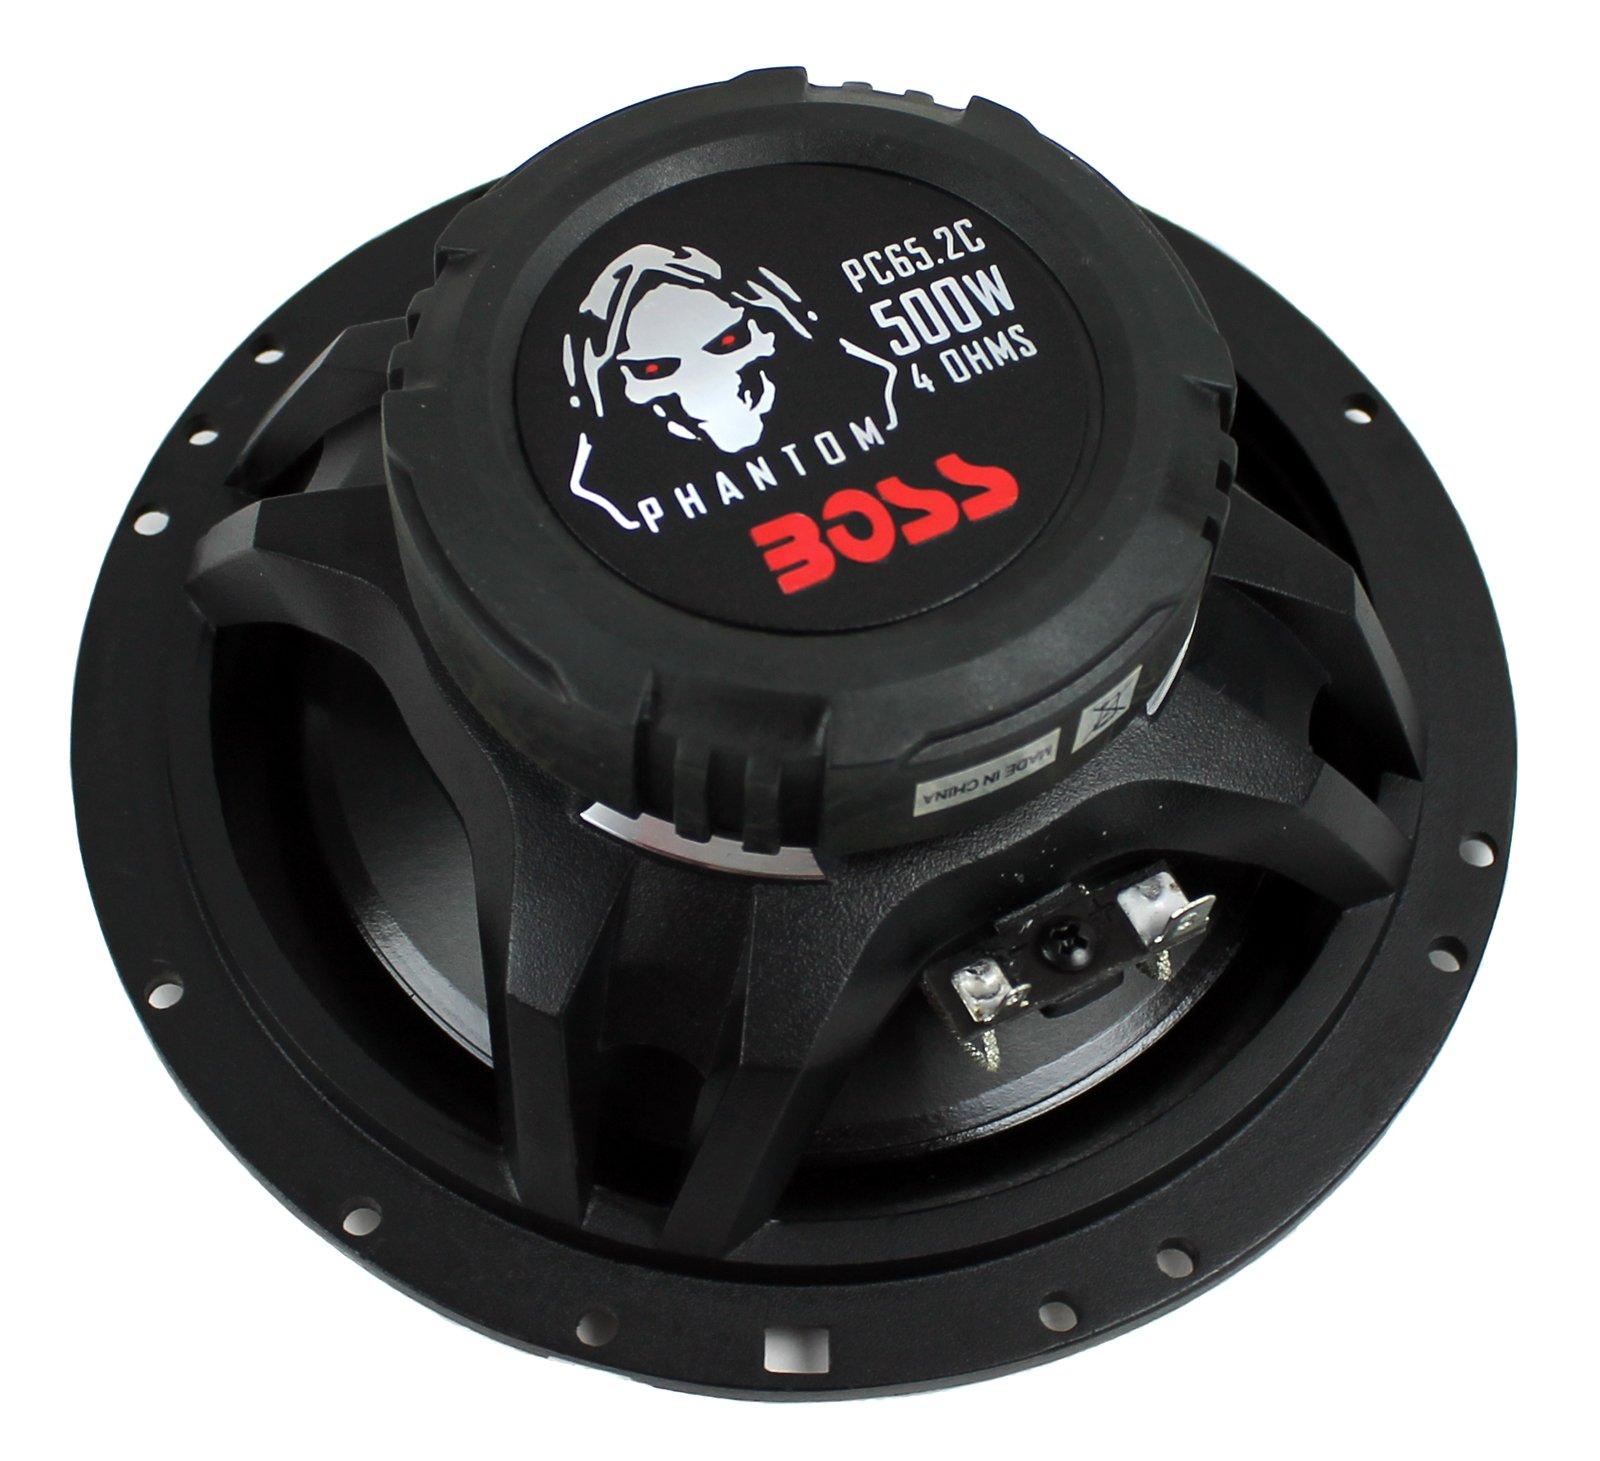 BOSPC652C - Boss Audio 6.5 PHNTM COMP SPKR WITH by BOSS Audio (Image #4)